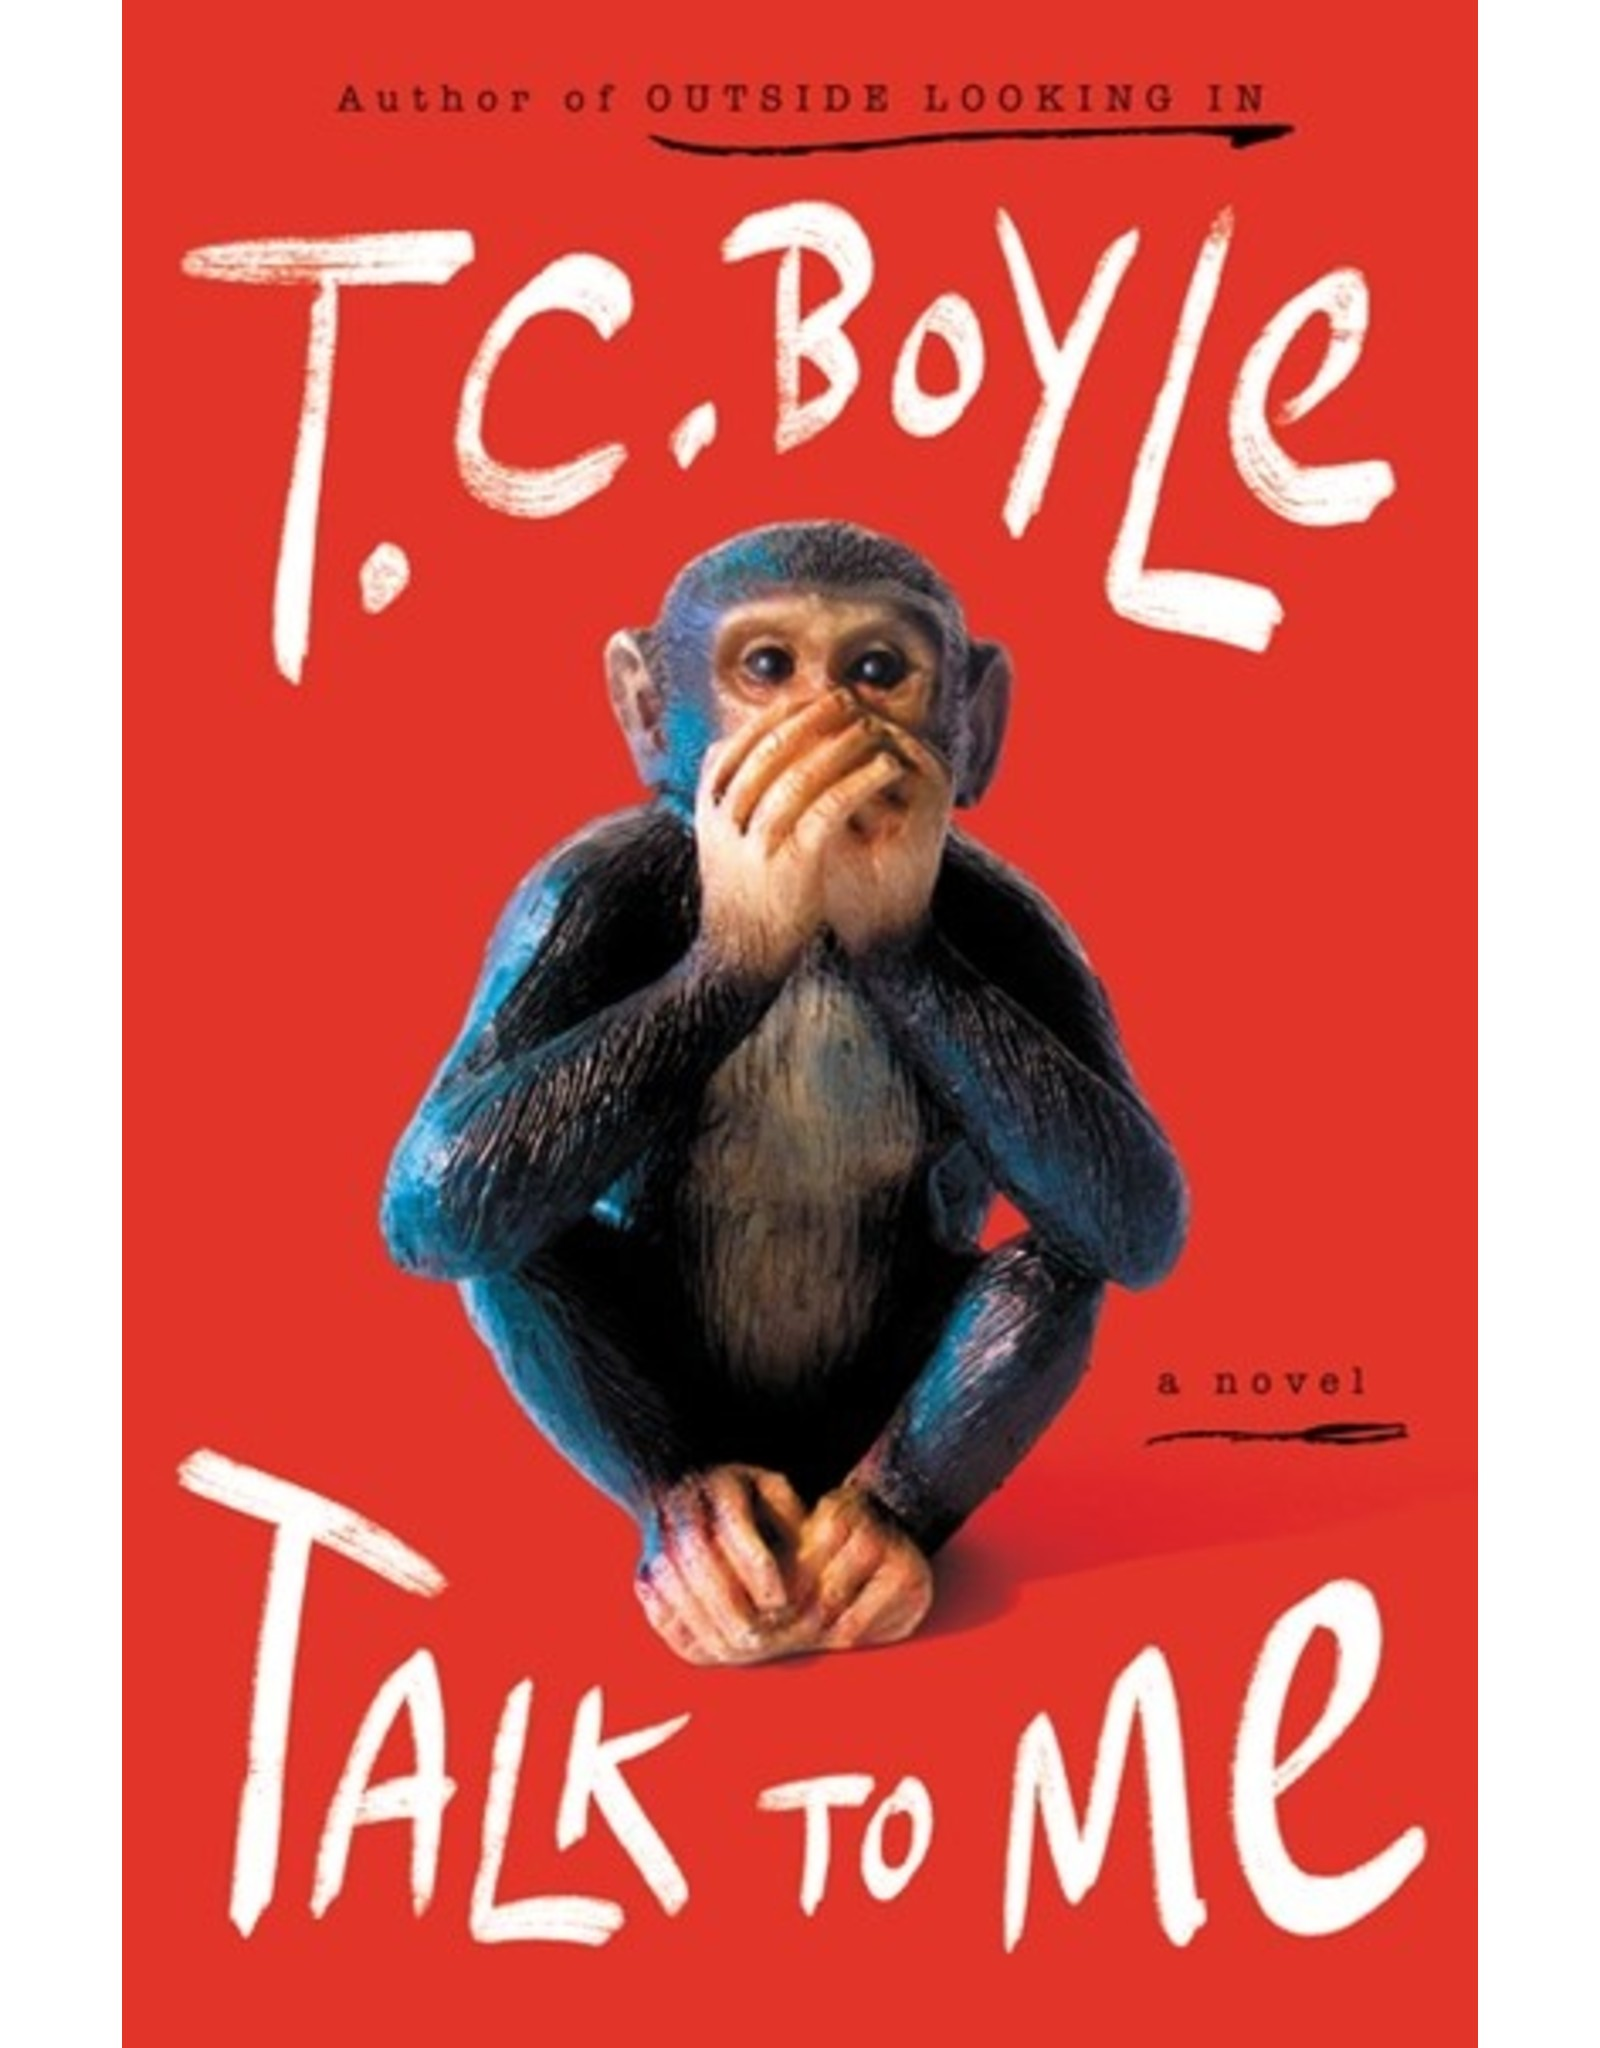 Books Talk to Me : A Novel by T. C. Boyle